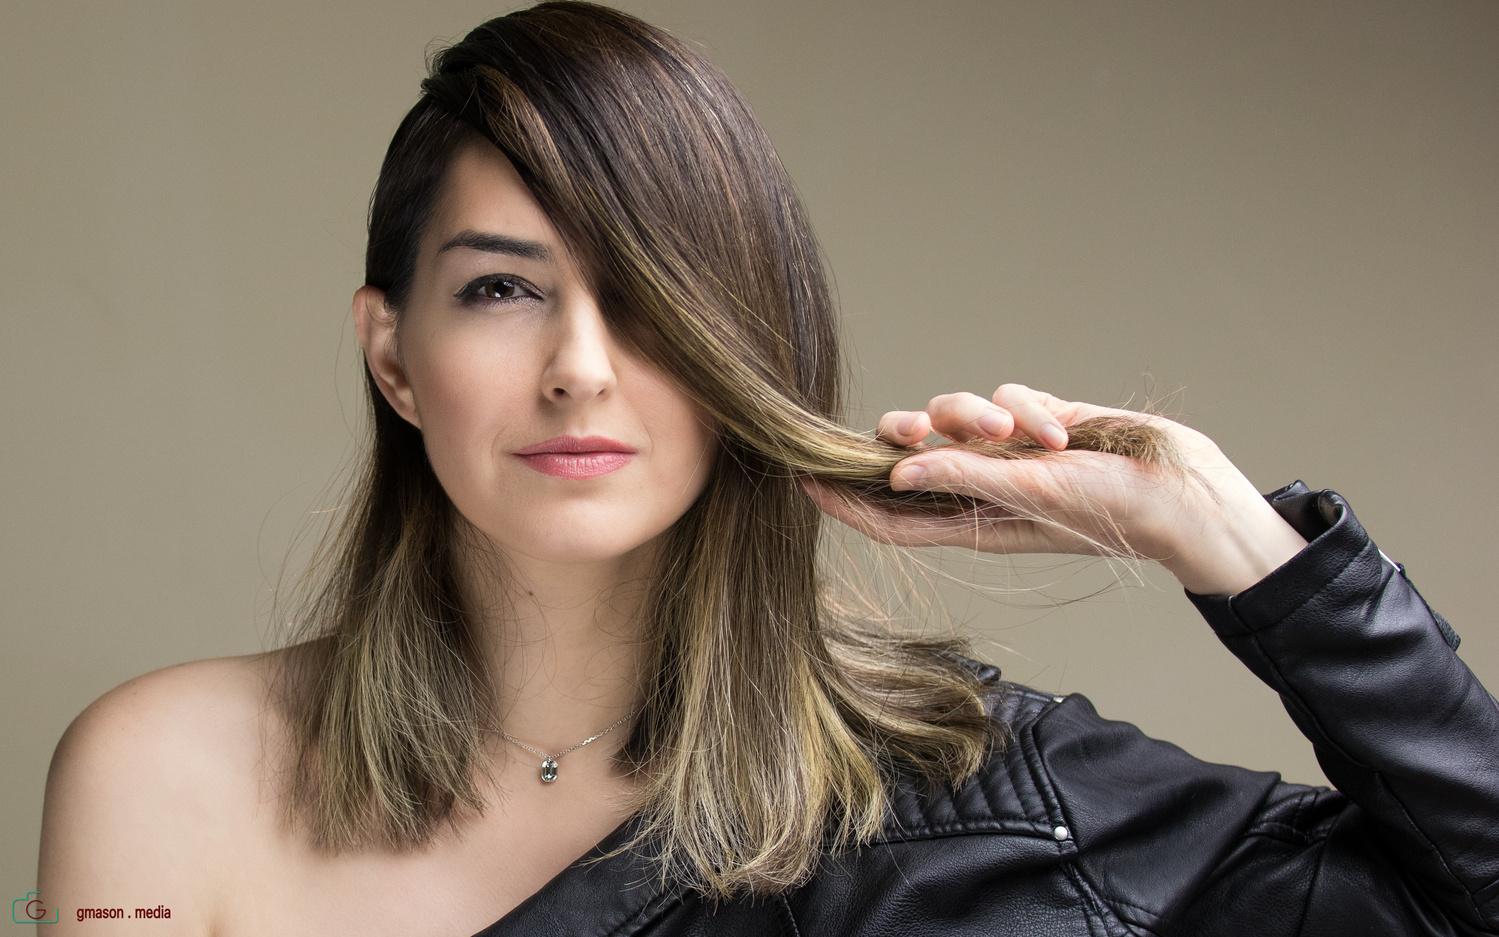 A bit of hair pulling by Gavin Mason